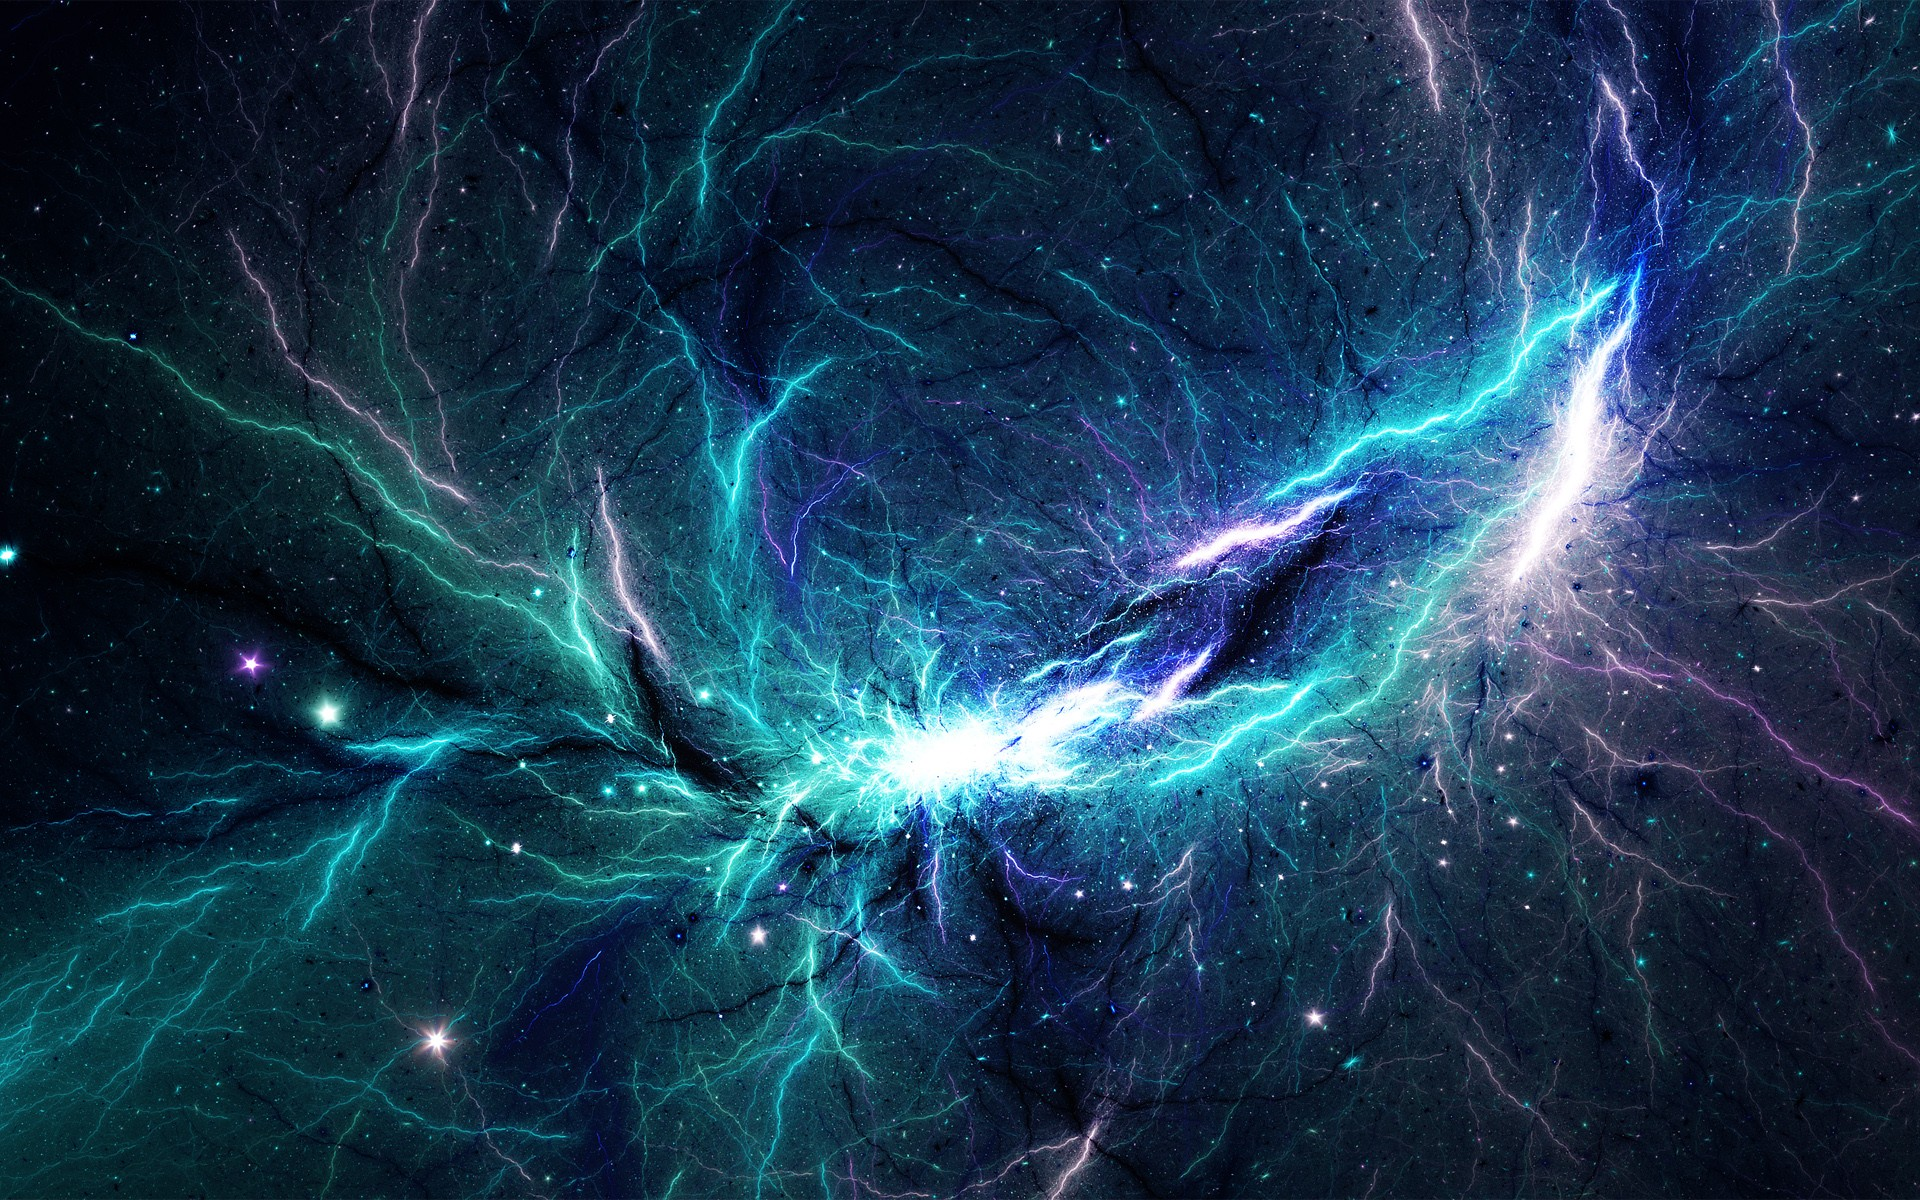 nebula wallpaper ·① download free beautiful full hd wallpapers for